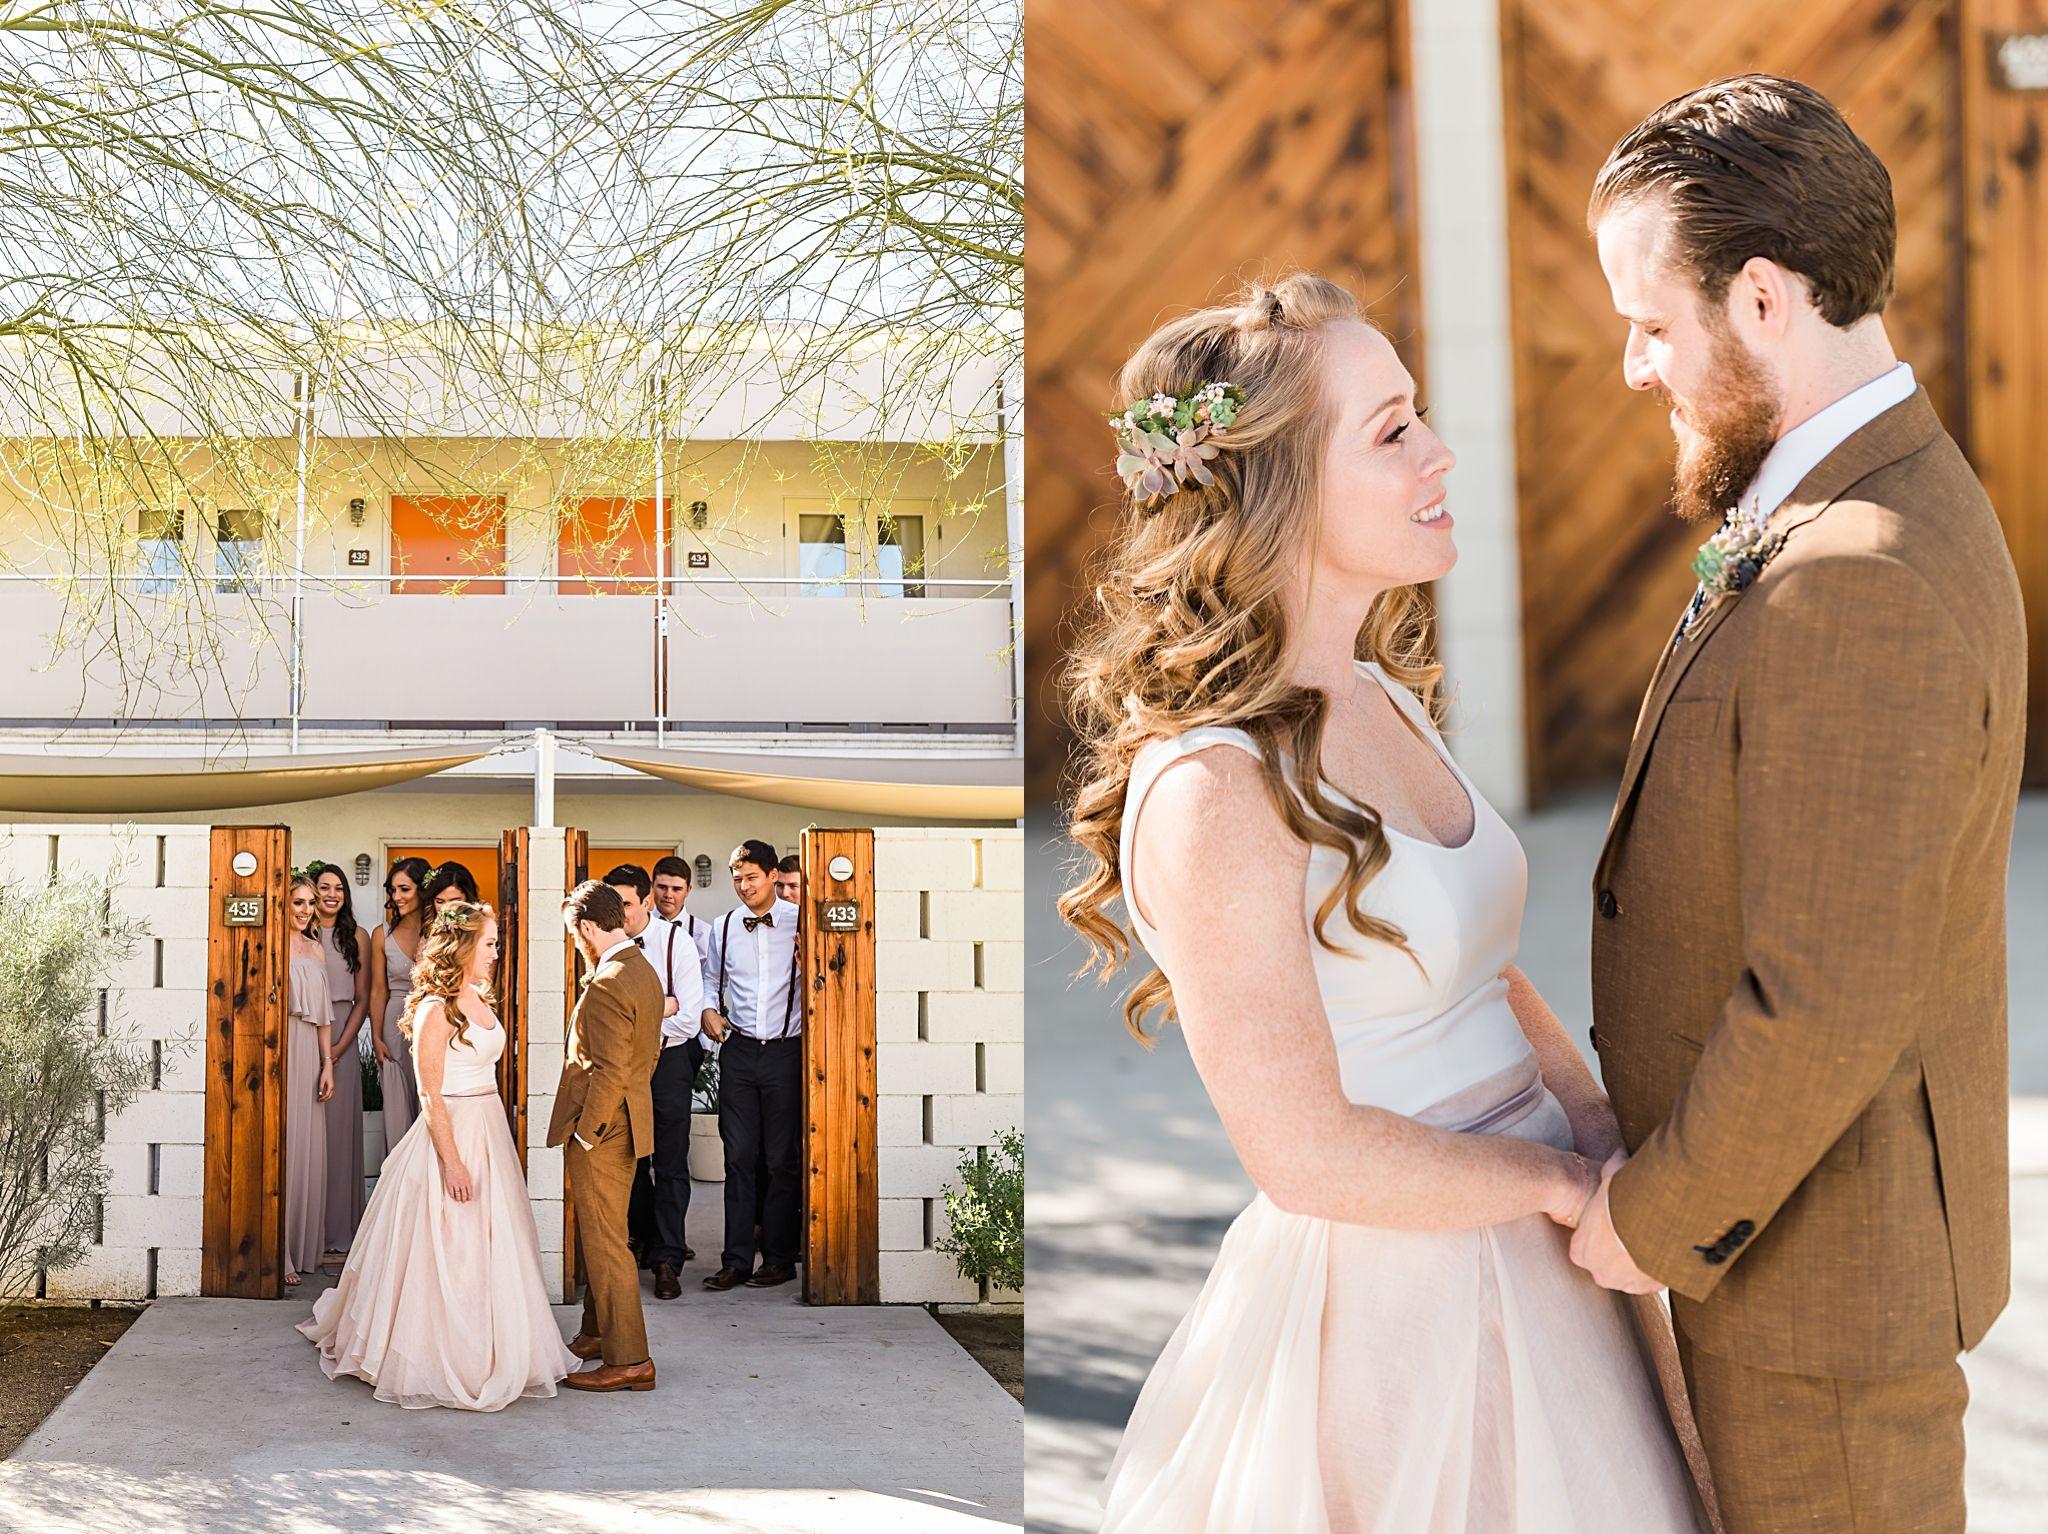 Natalie garrettus diy boho ace hotel wedding in palm springs